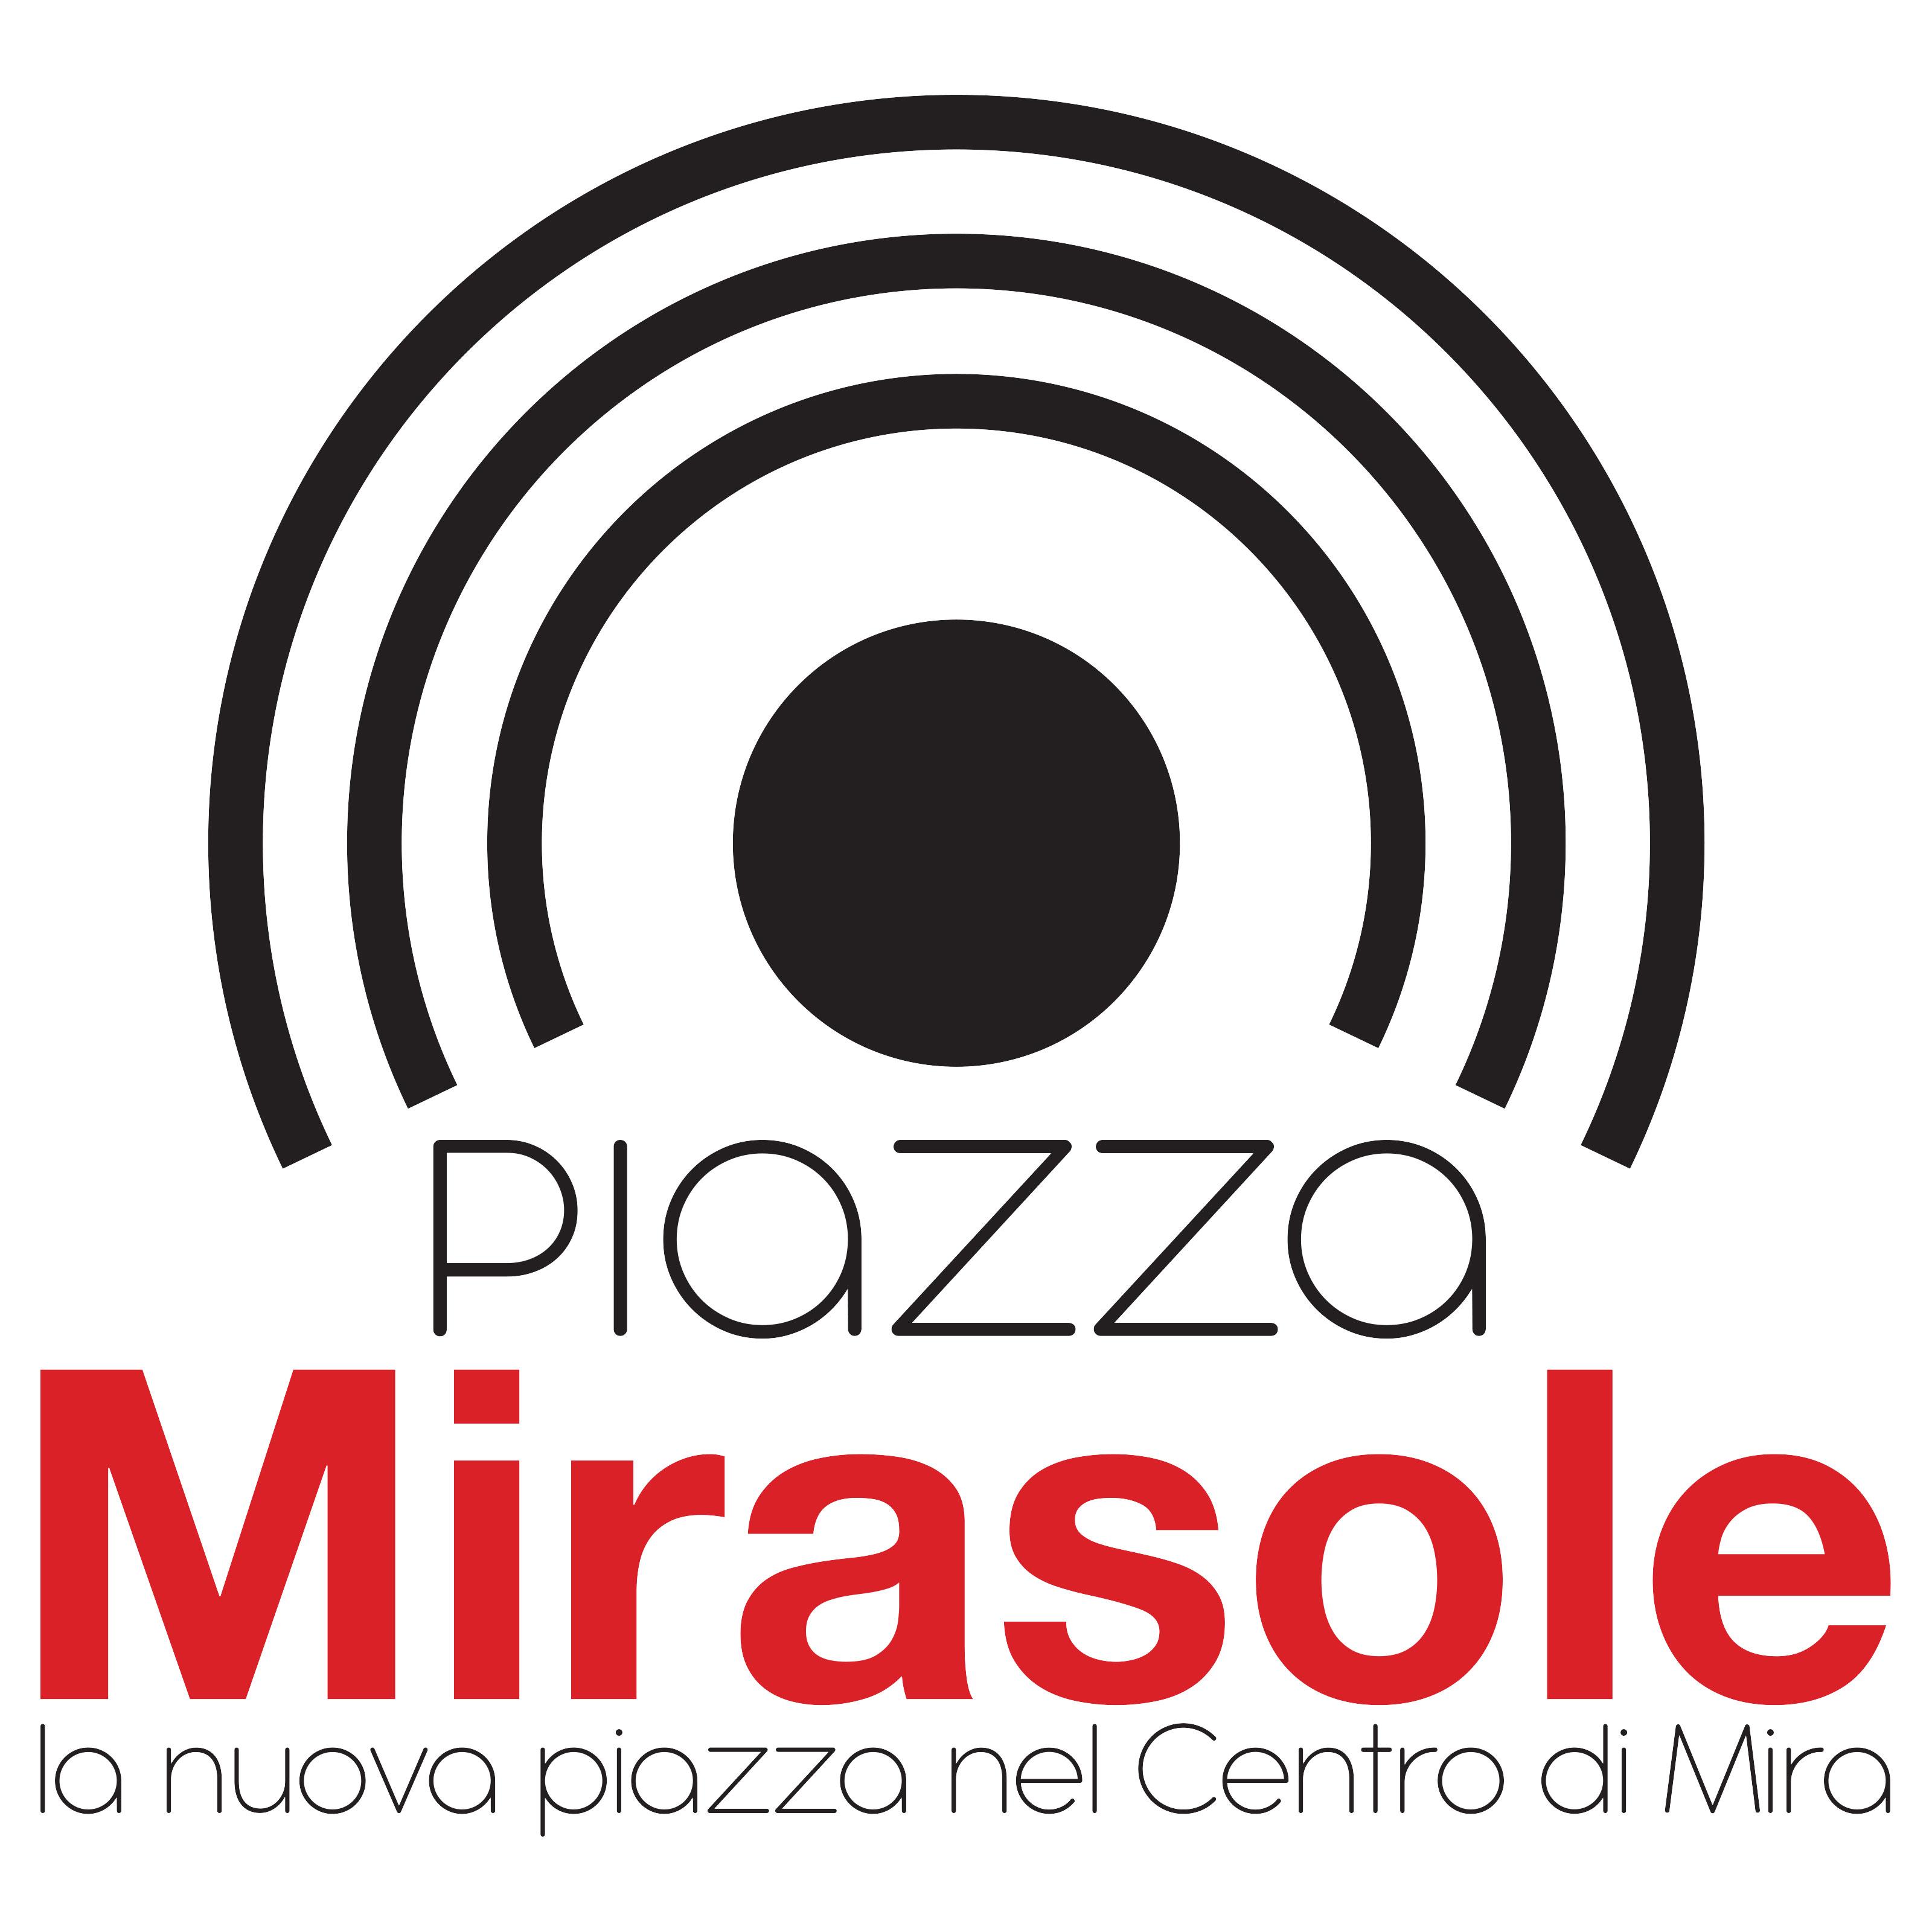 piazza-mirasole-base-FOTO-PER-WEB